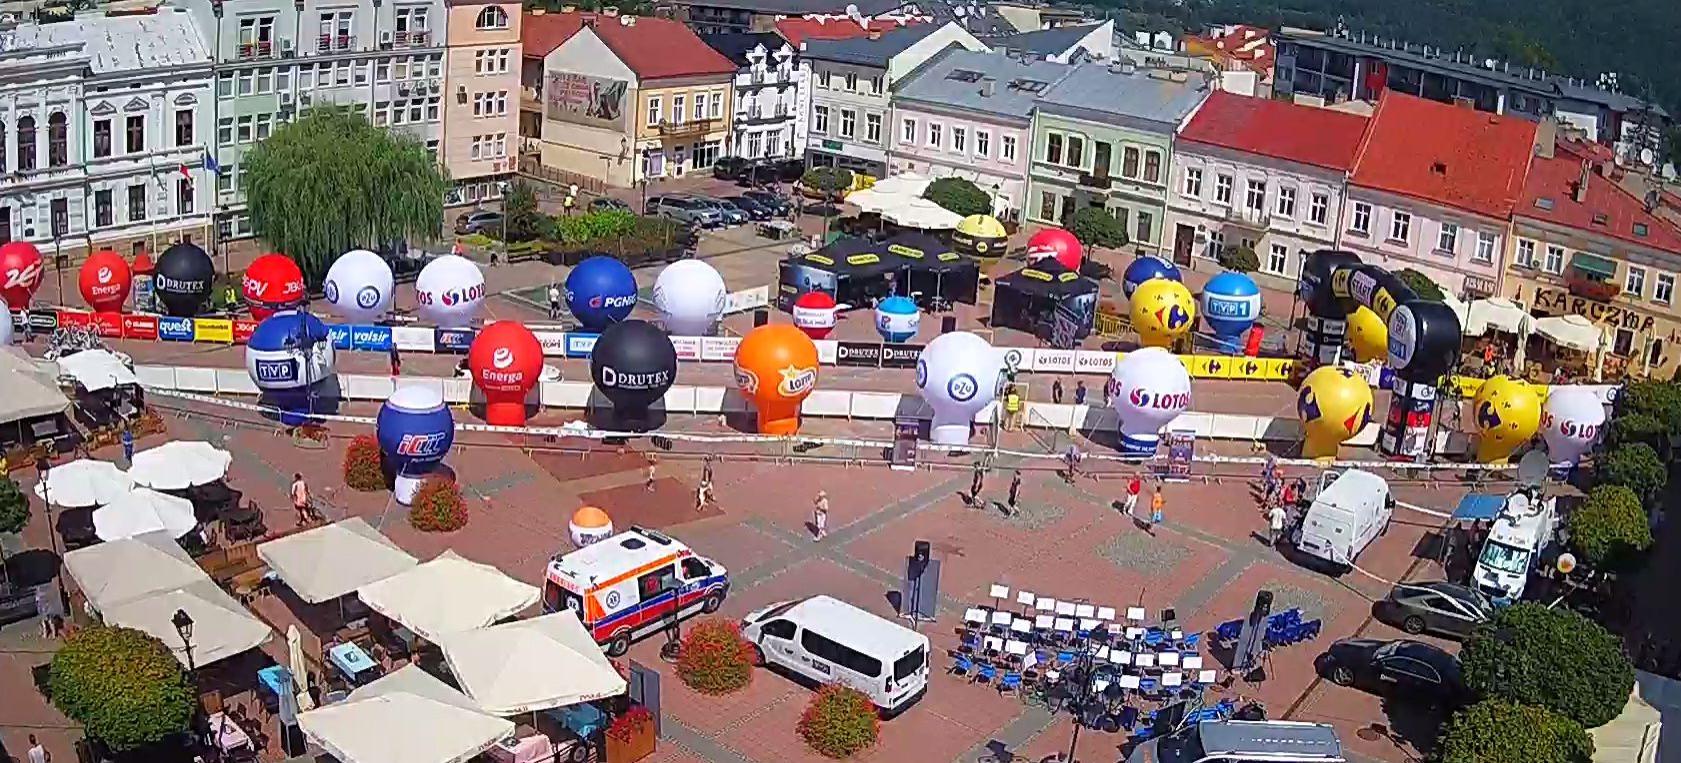 Tour de Pologne NA ŻYWO z sanockiego Rynku! (VIDEO)